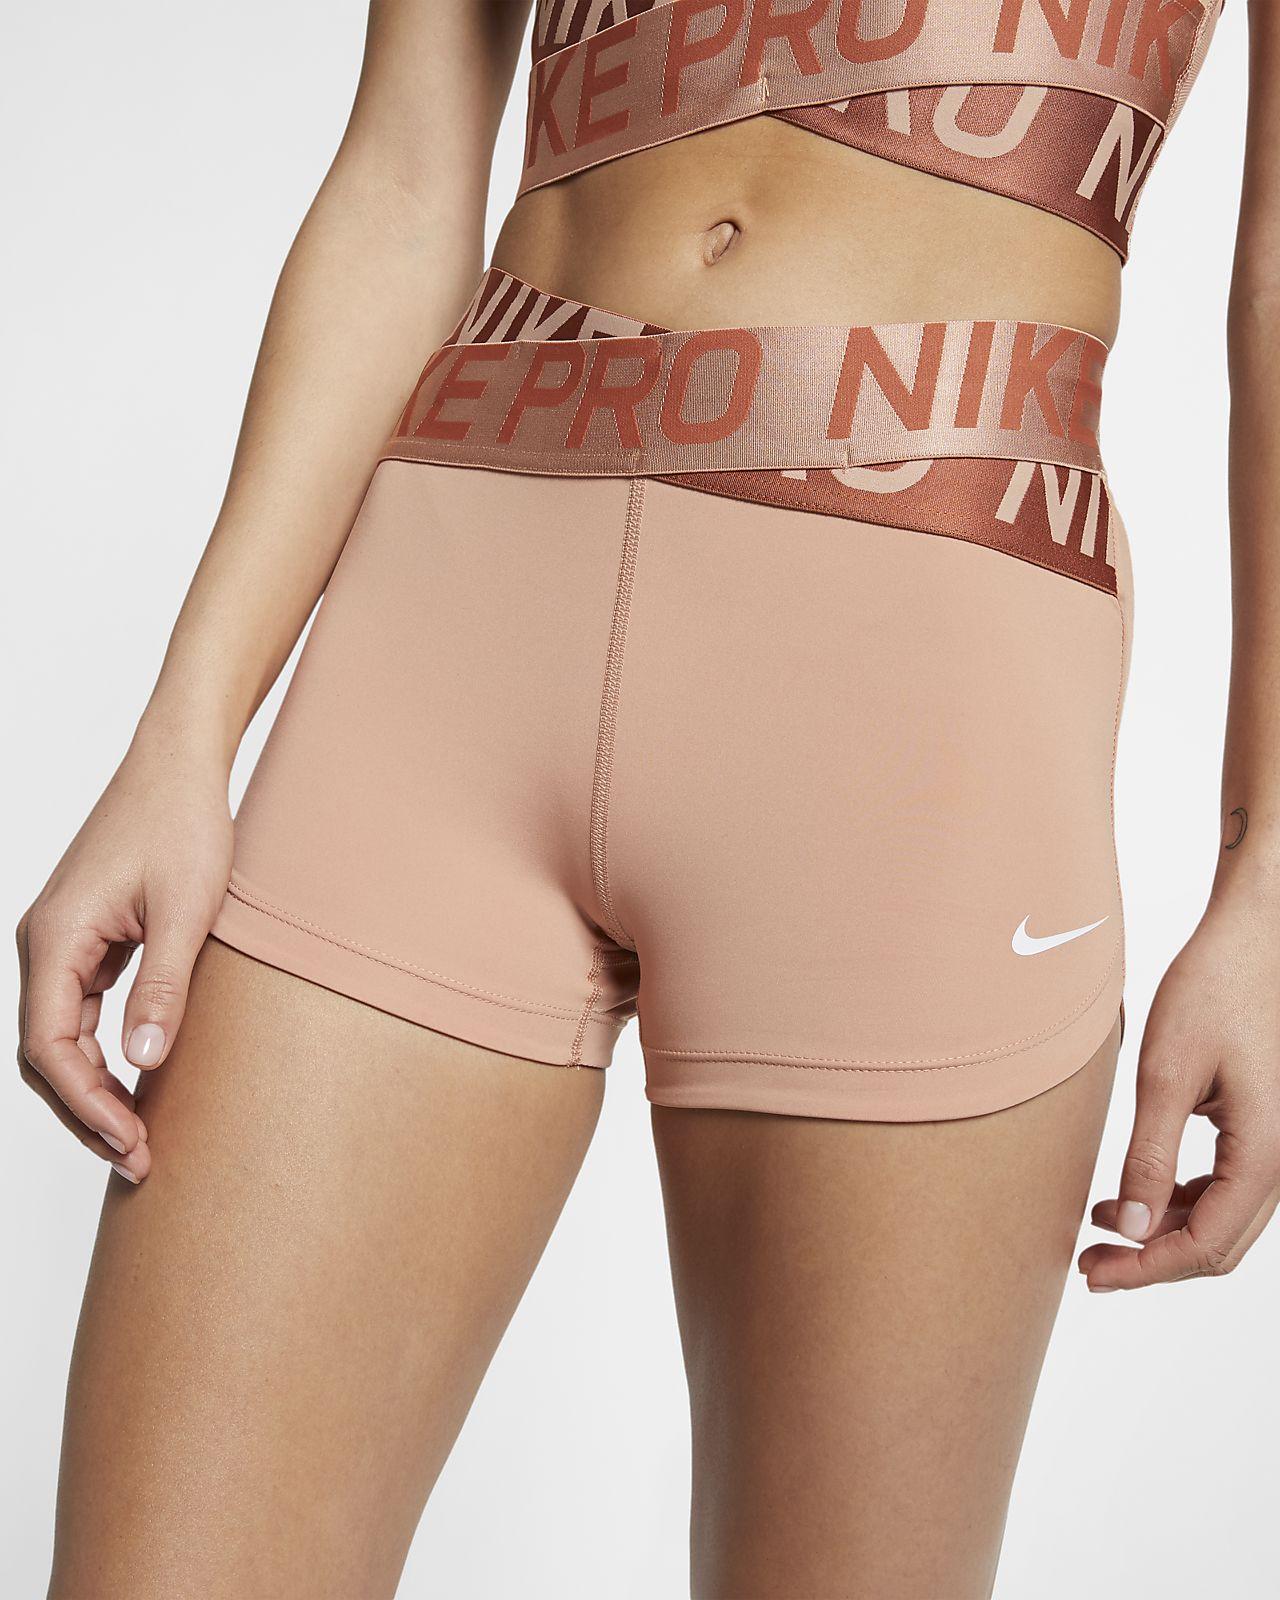 Shorts 8 cm Nike Pro Intertwist - Donna